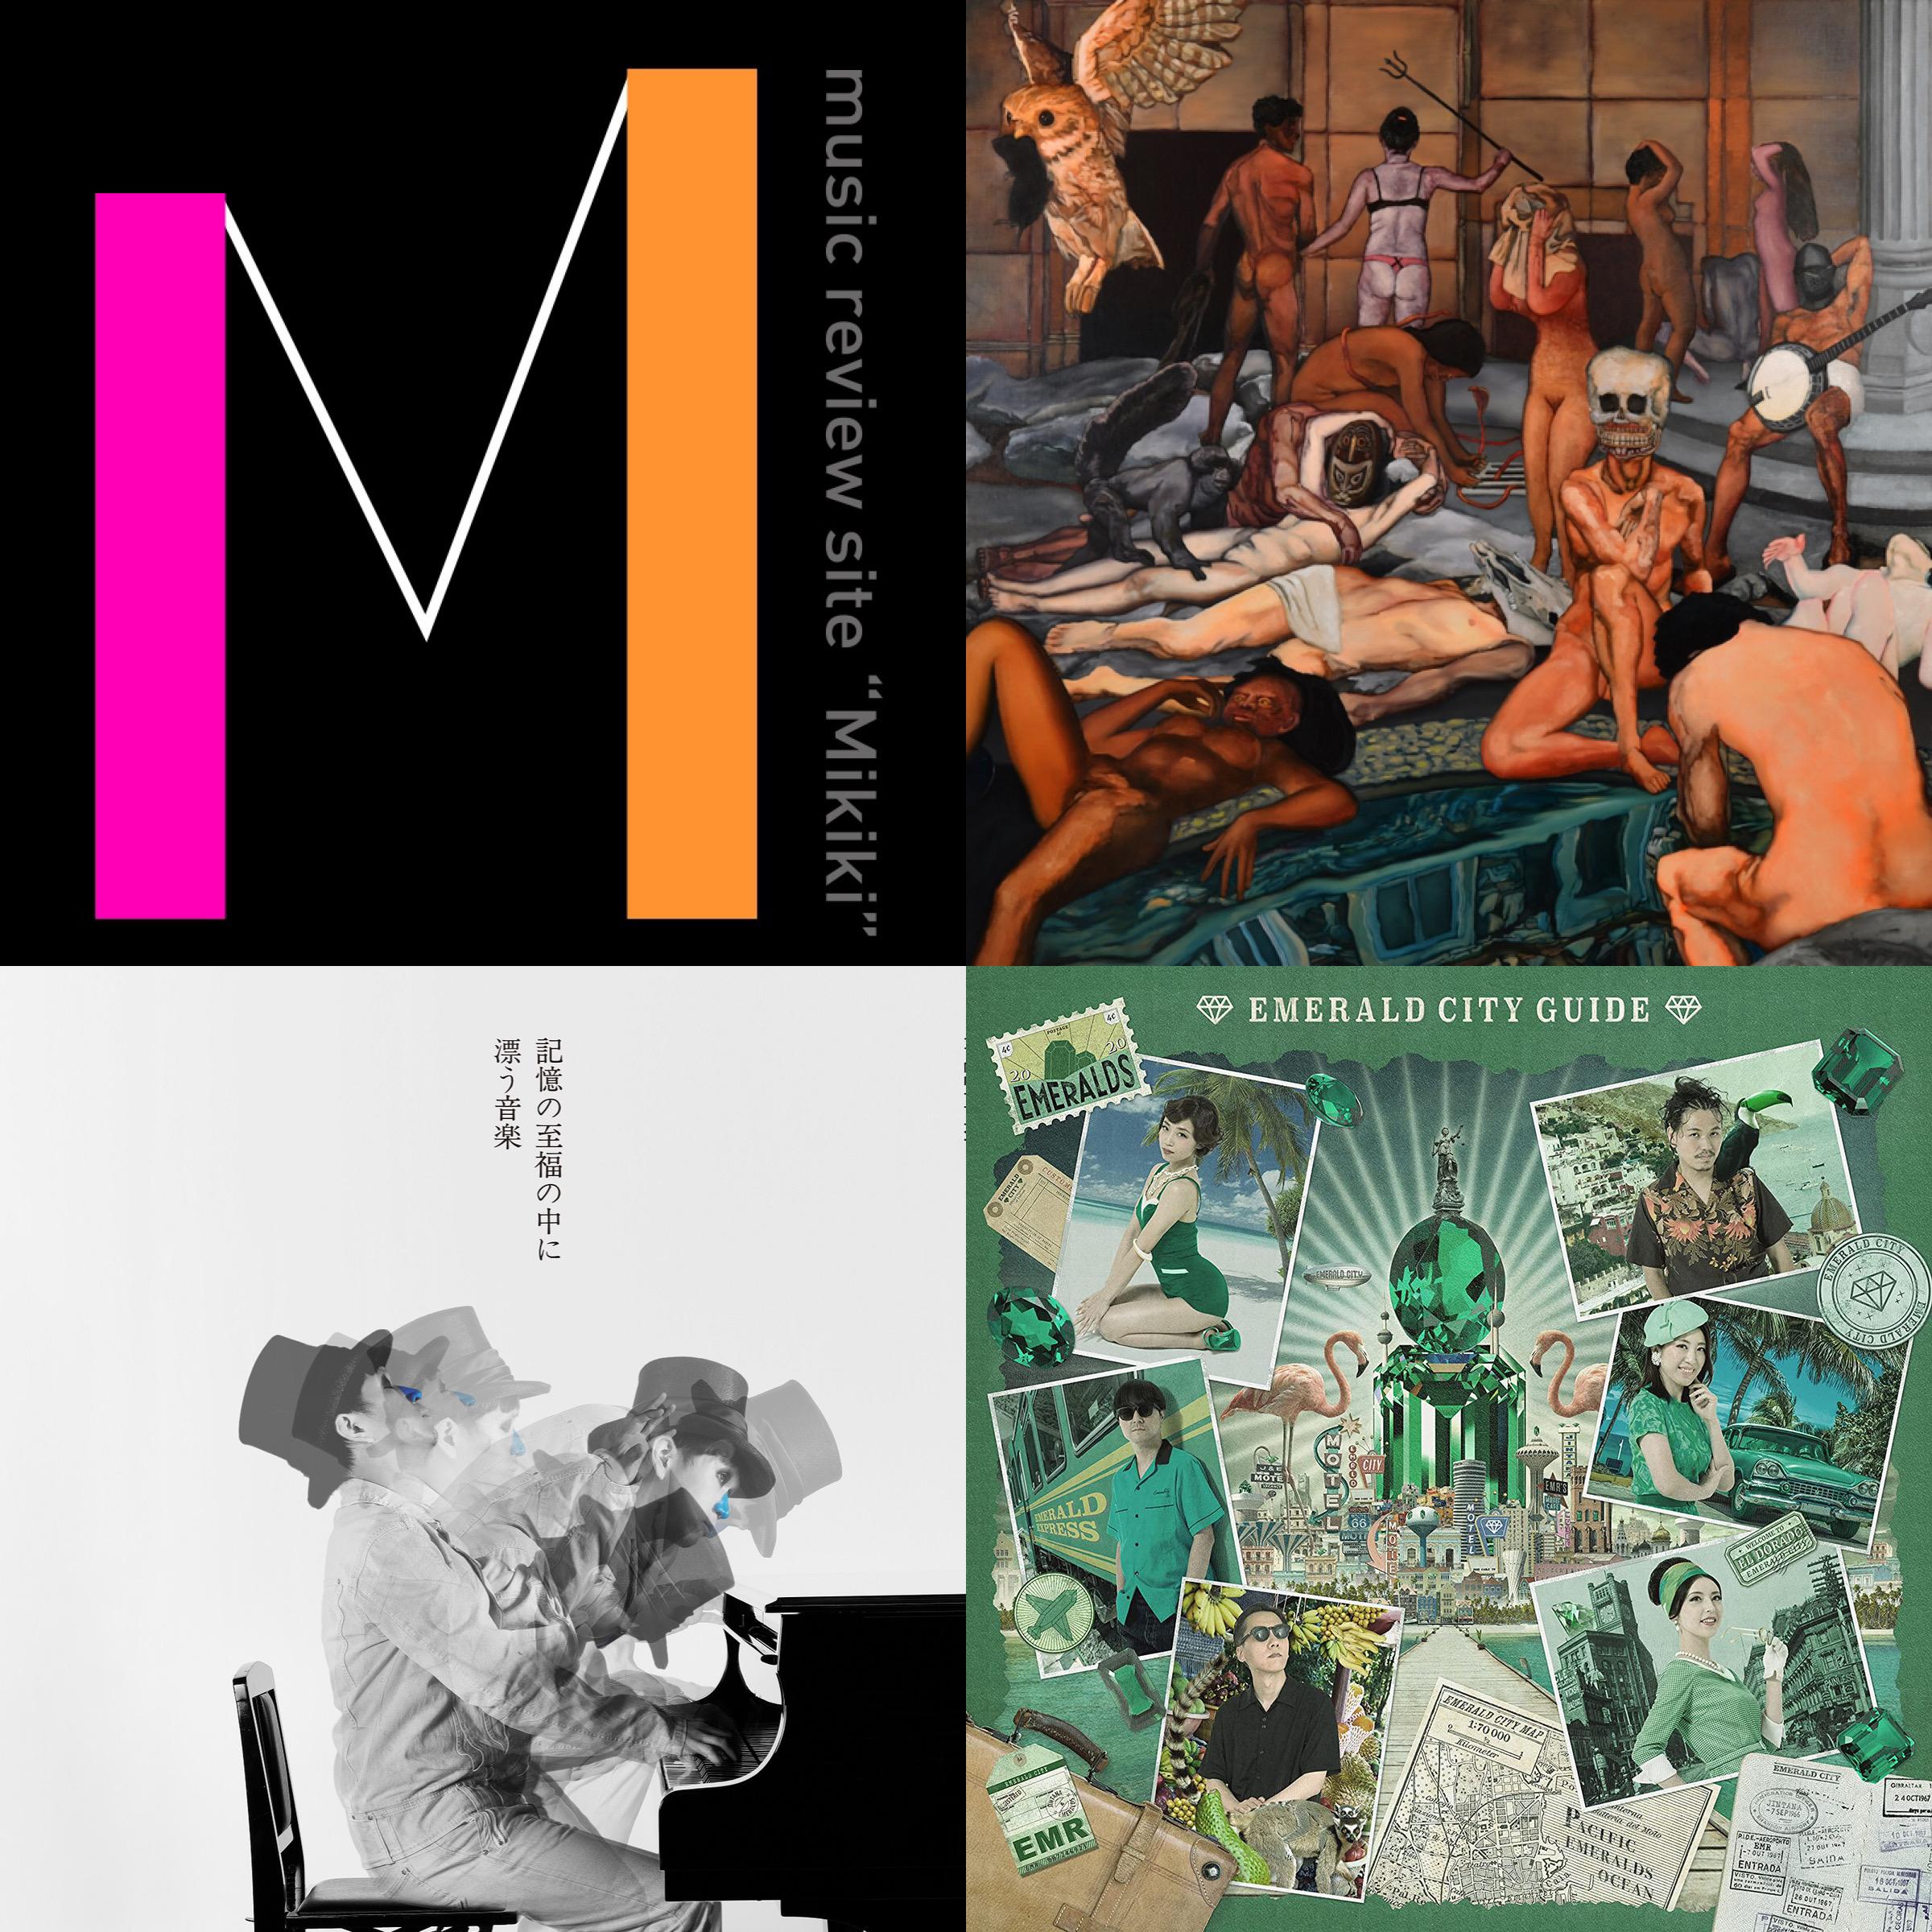 Dos Monos、H ZETT M、JINTANA & EMERALDSなど今週リリースのMikiki推し邦楽アルバム/EP7選!